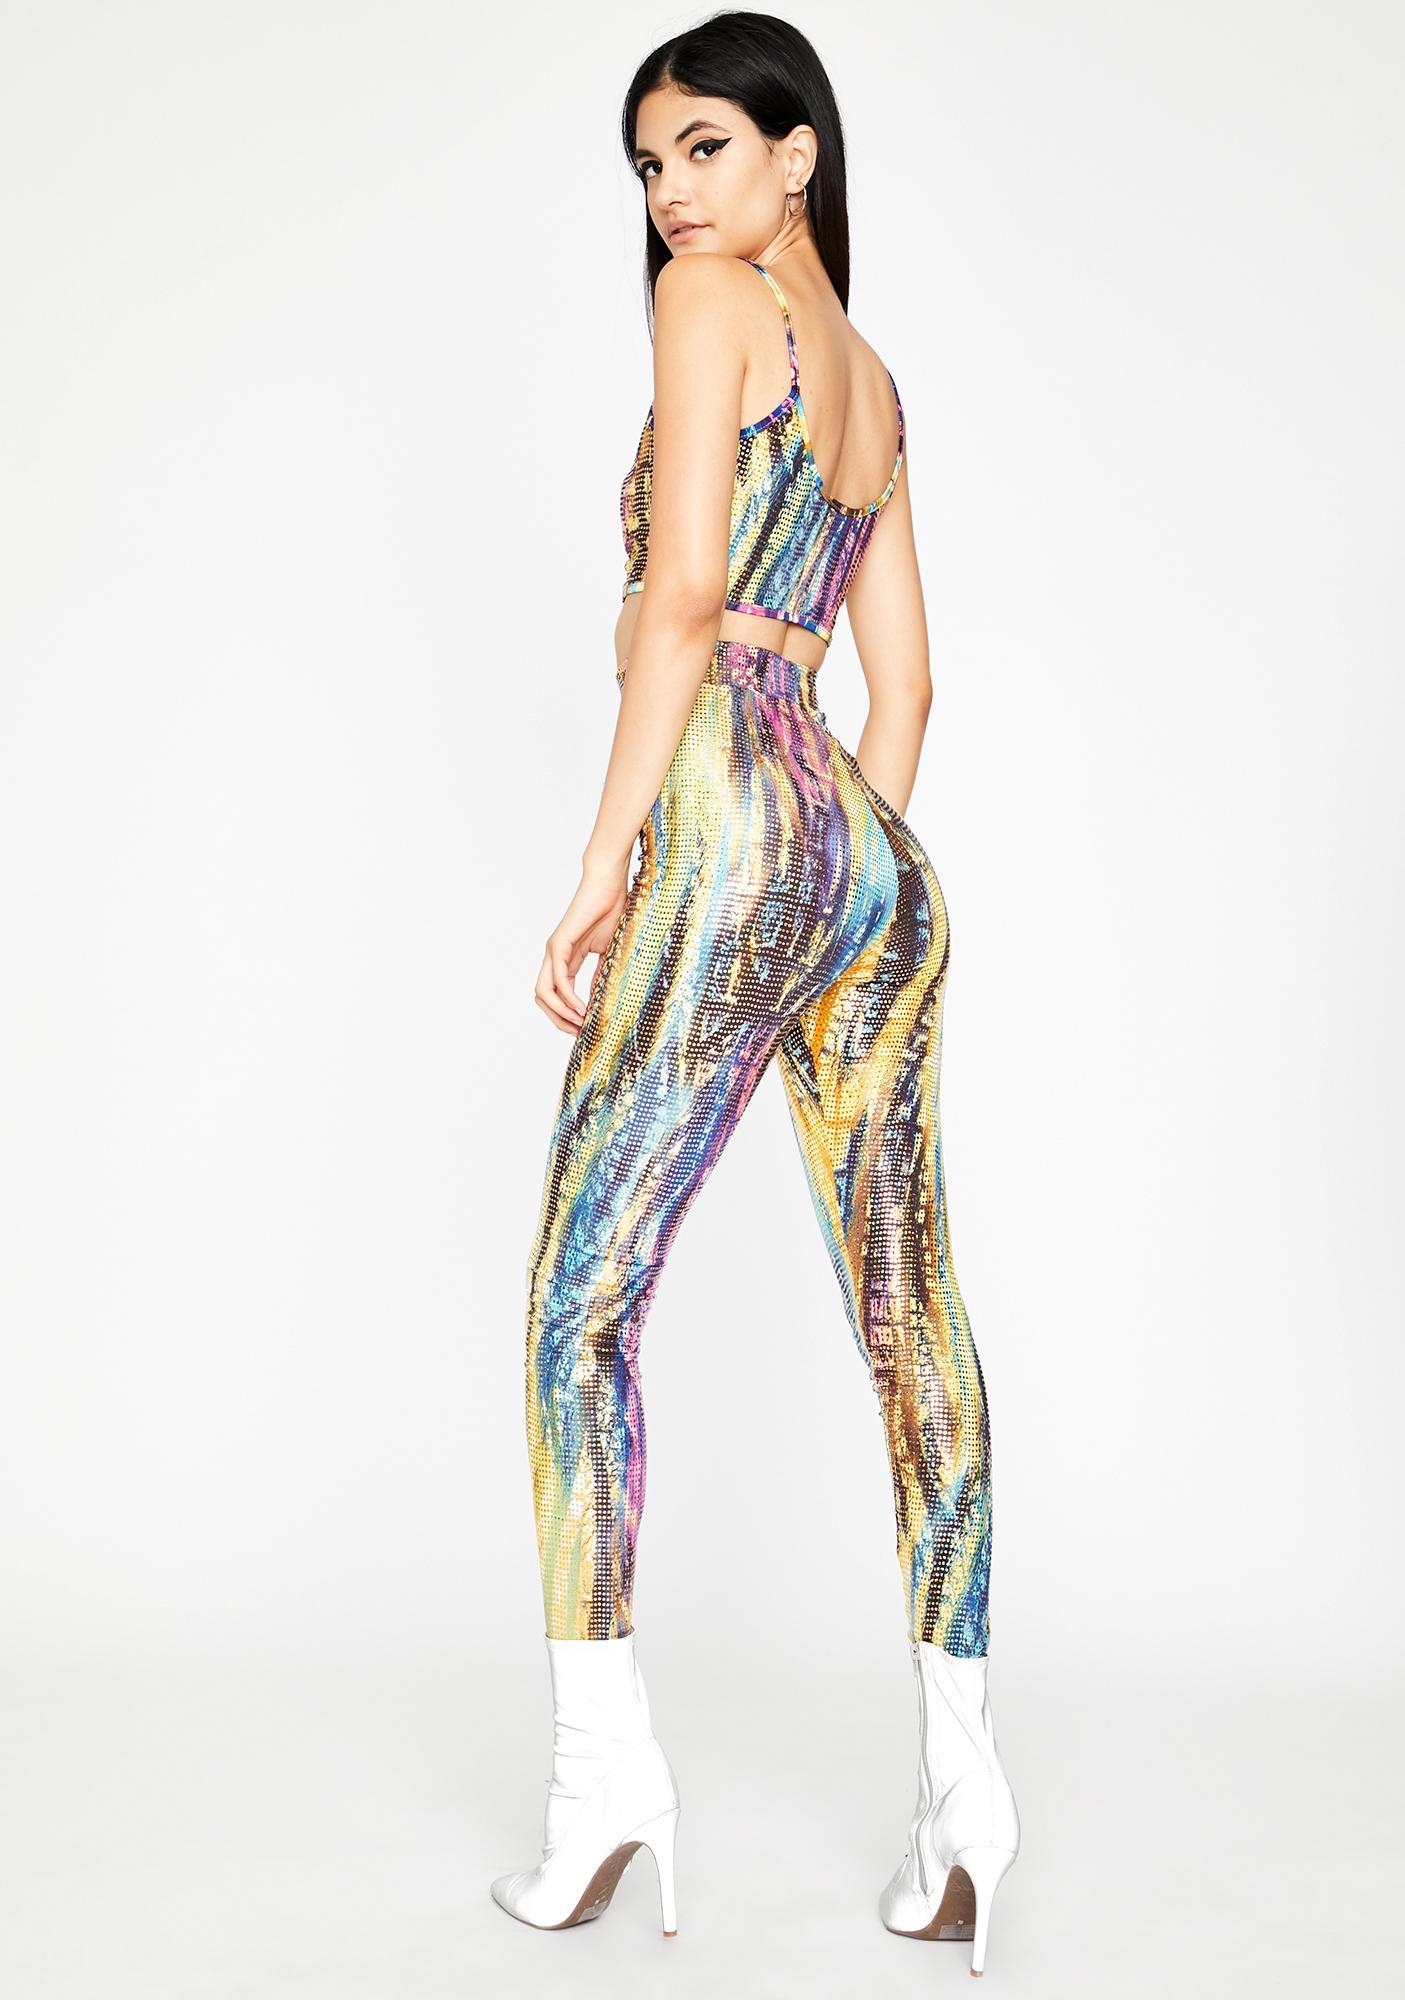 Made Of Art Pant Set